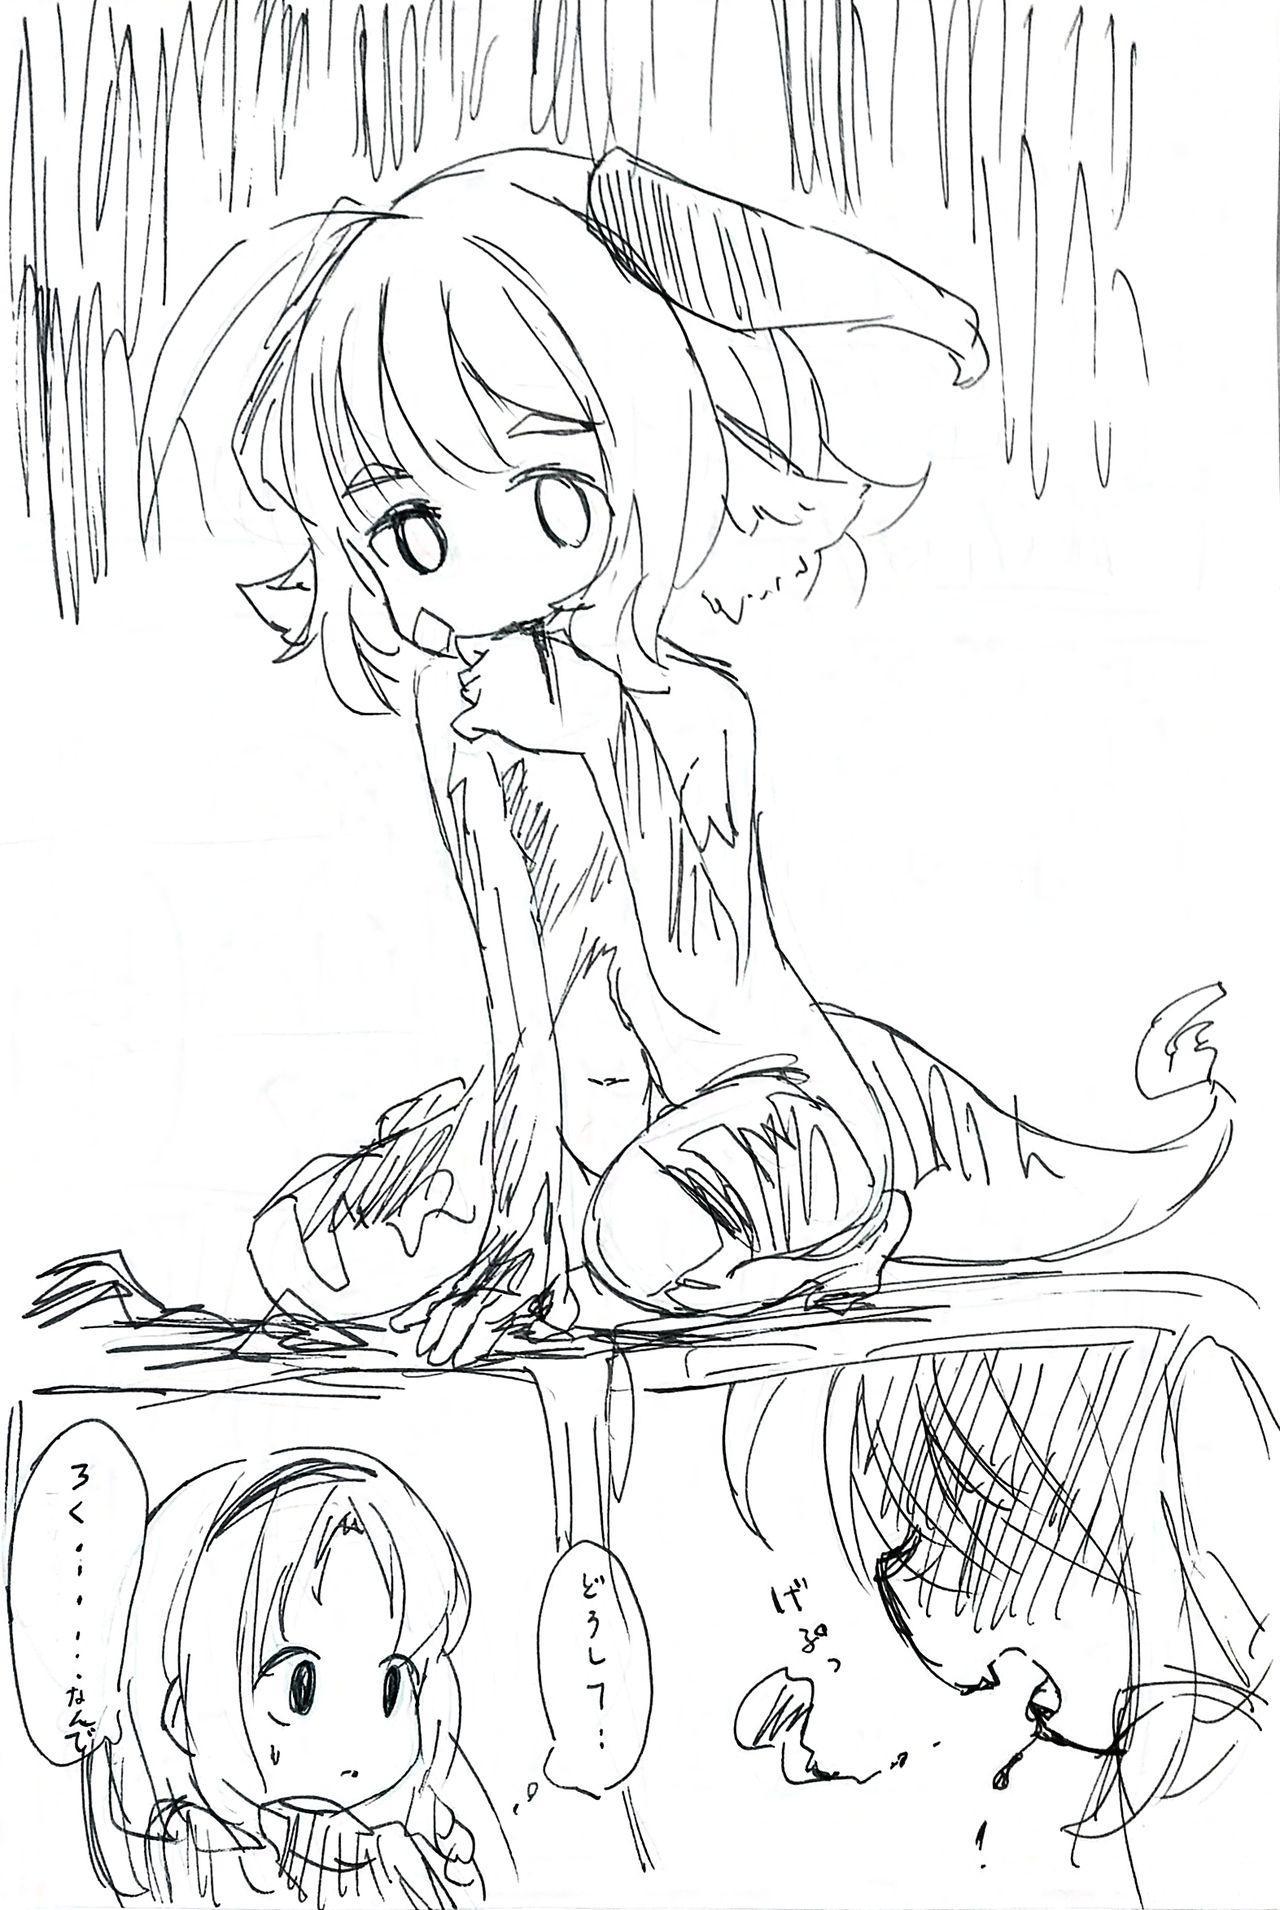 Hisui-chan carnival biyori 3